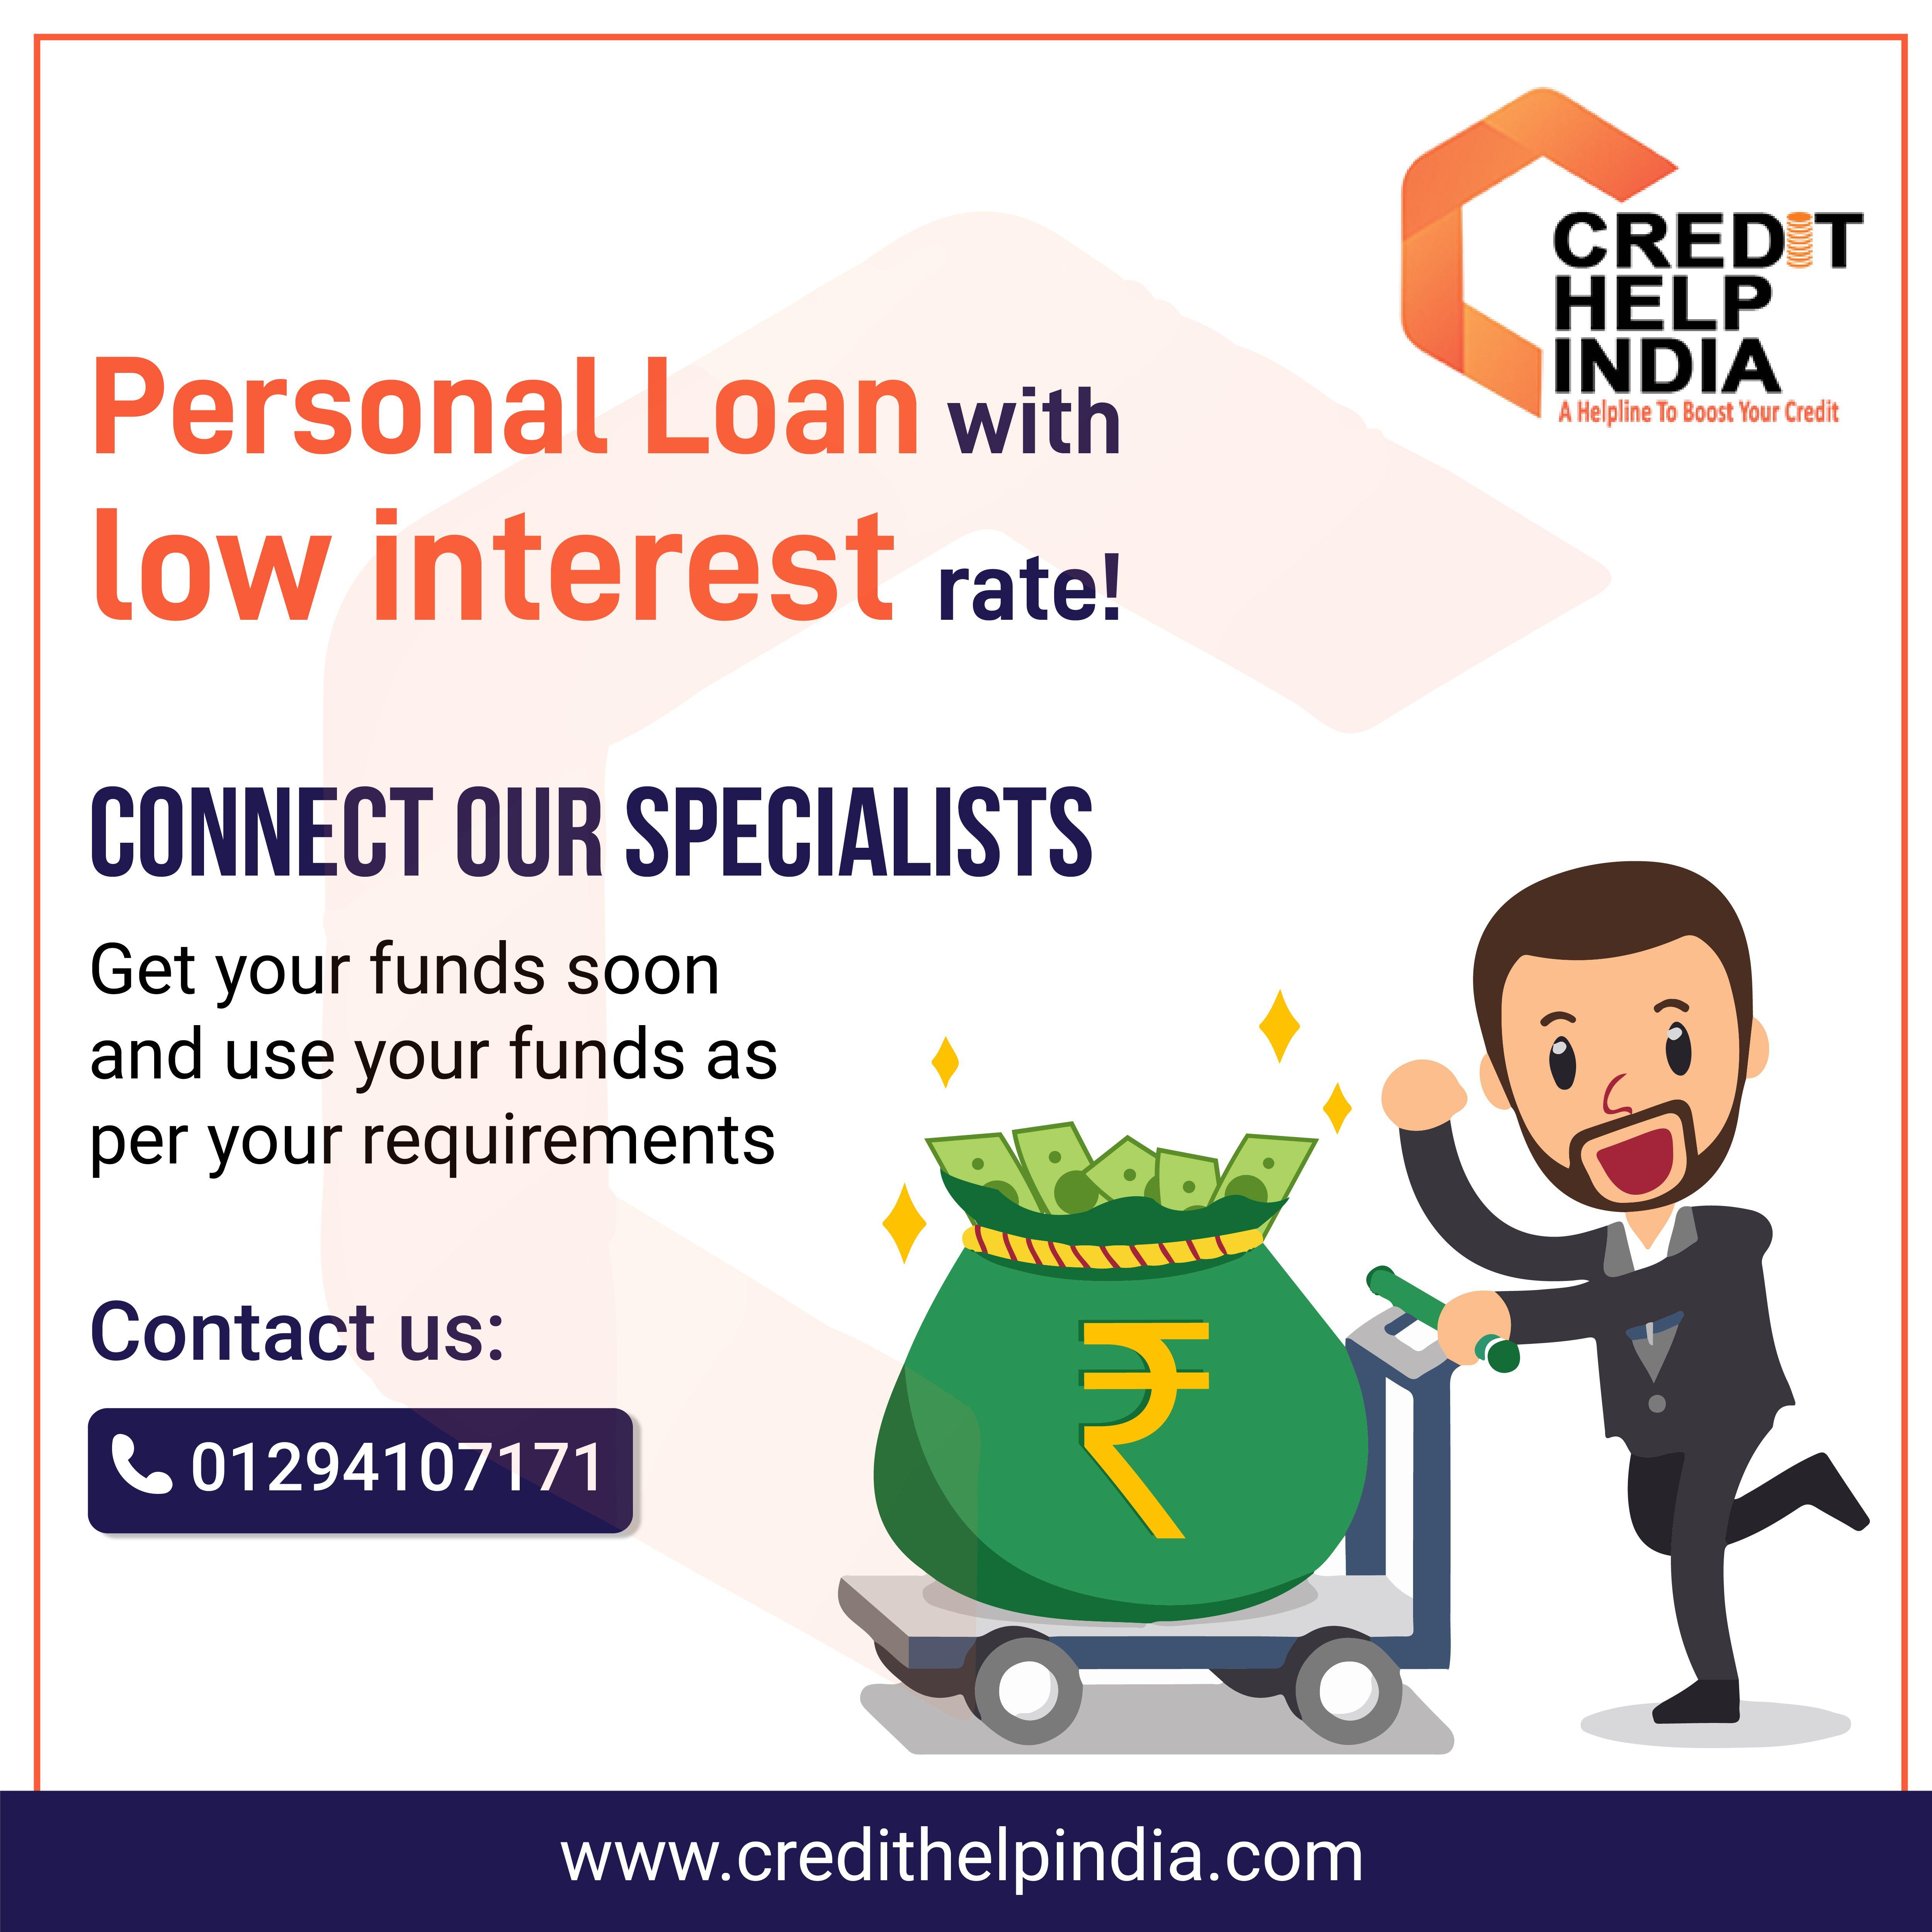 Personal Loan In 2020 Personal Loans Improve Credit Score Improve Credit